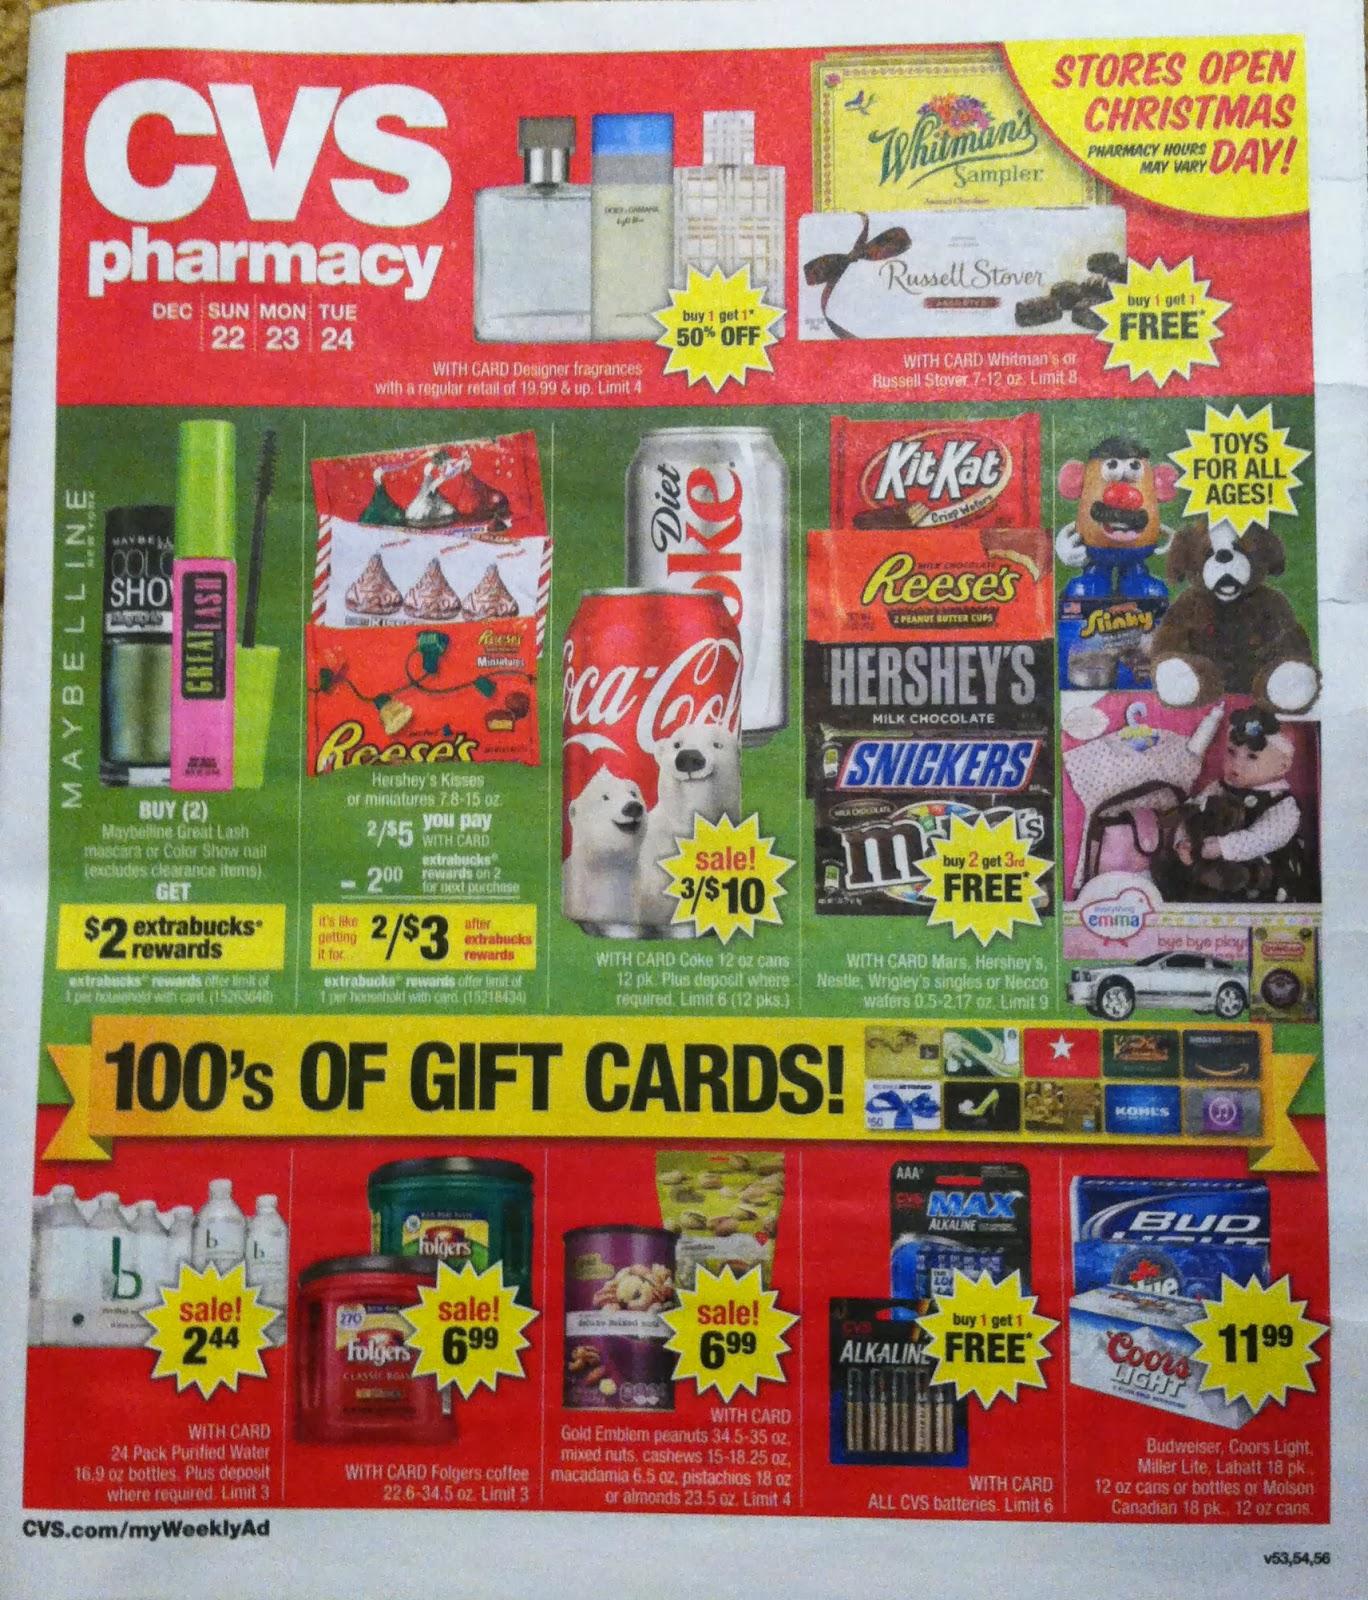 cvs ad scan preview for the pre christmas cvs ad 1222 1224